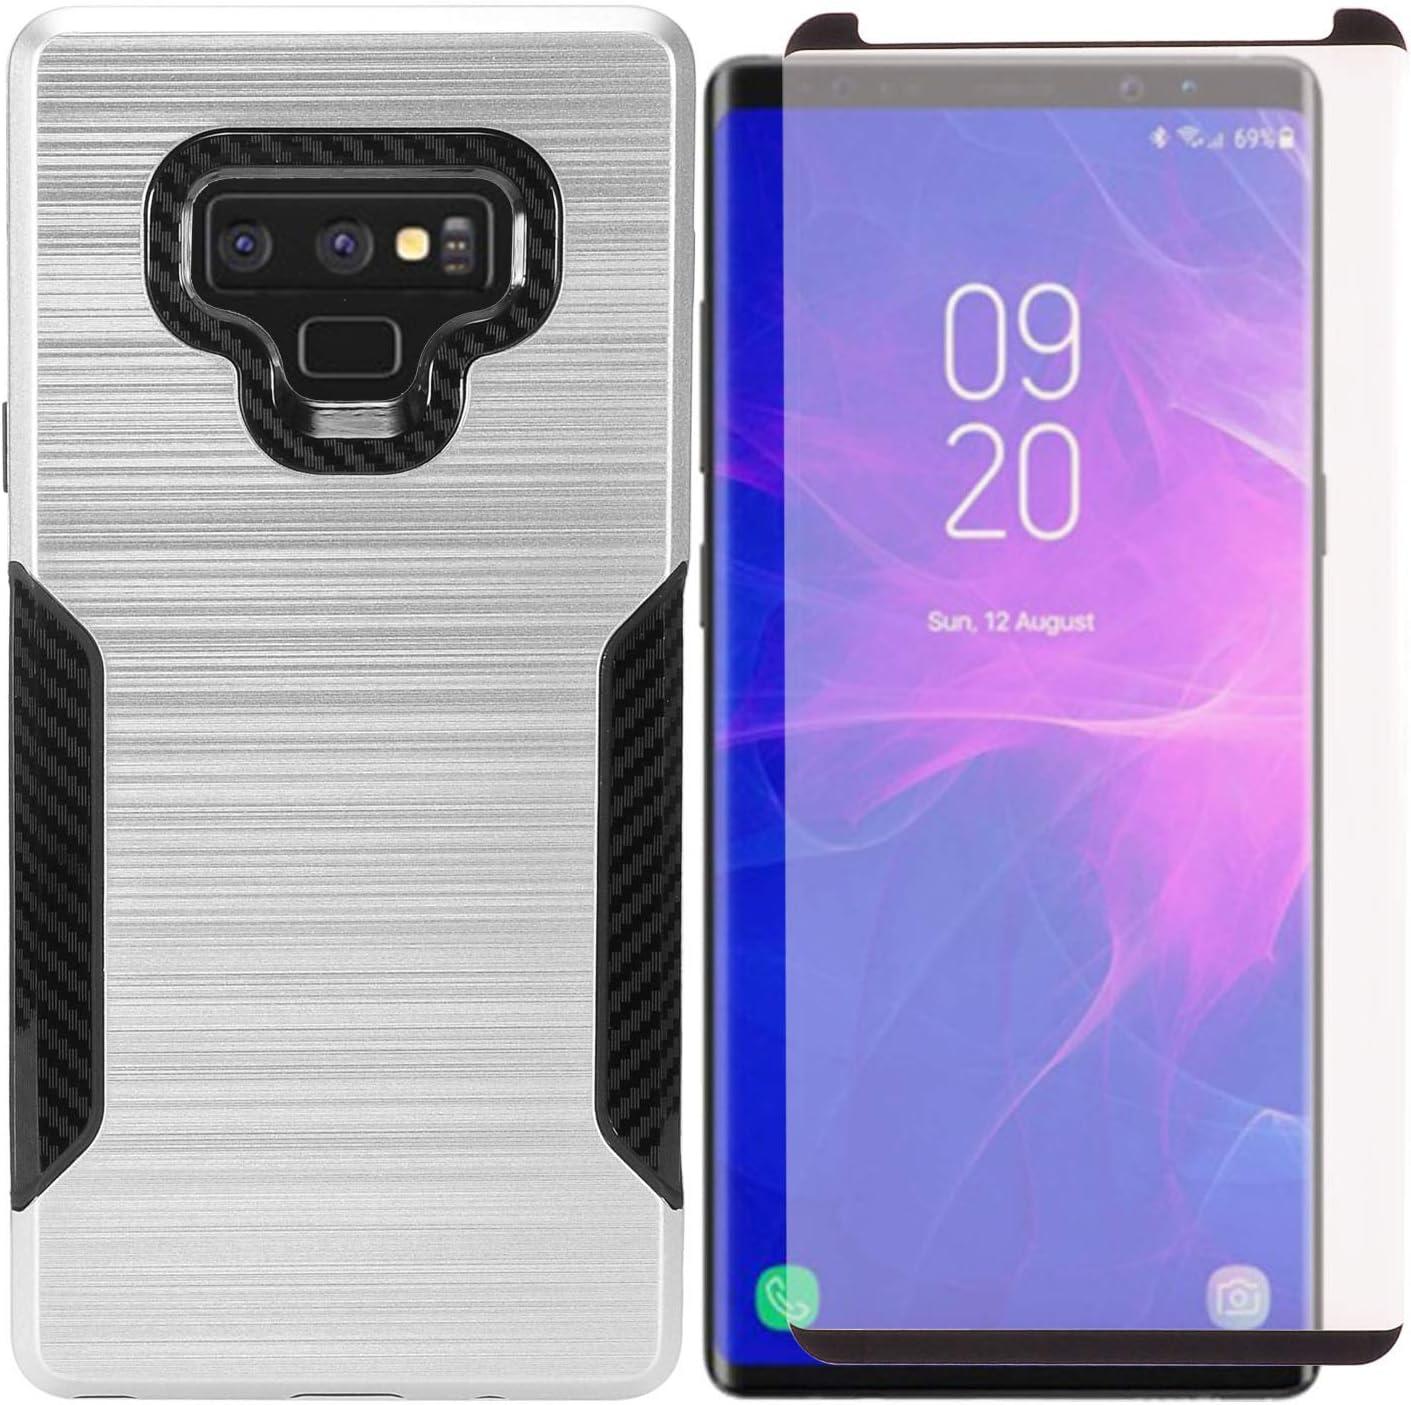 Schwarz Everainy Kompatibel f/ür Samsung Galaxy Note 9 Silikon H/ülle 3D Einhorn Muster Ultrad/ünn H/üllen Handyh/ülle Gummi Schutzh/ülle Sto/ßfest TPU Gel Sto/ßstange Cover